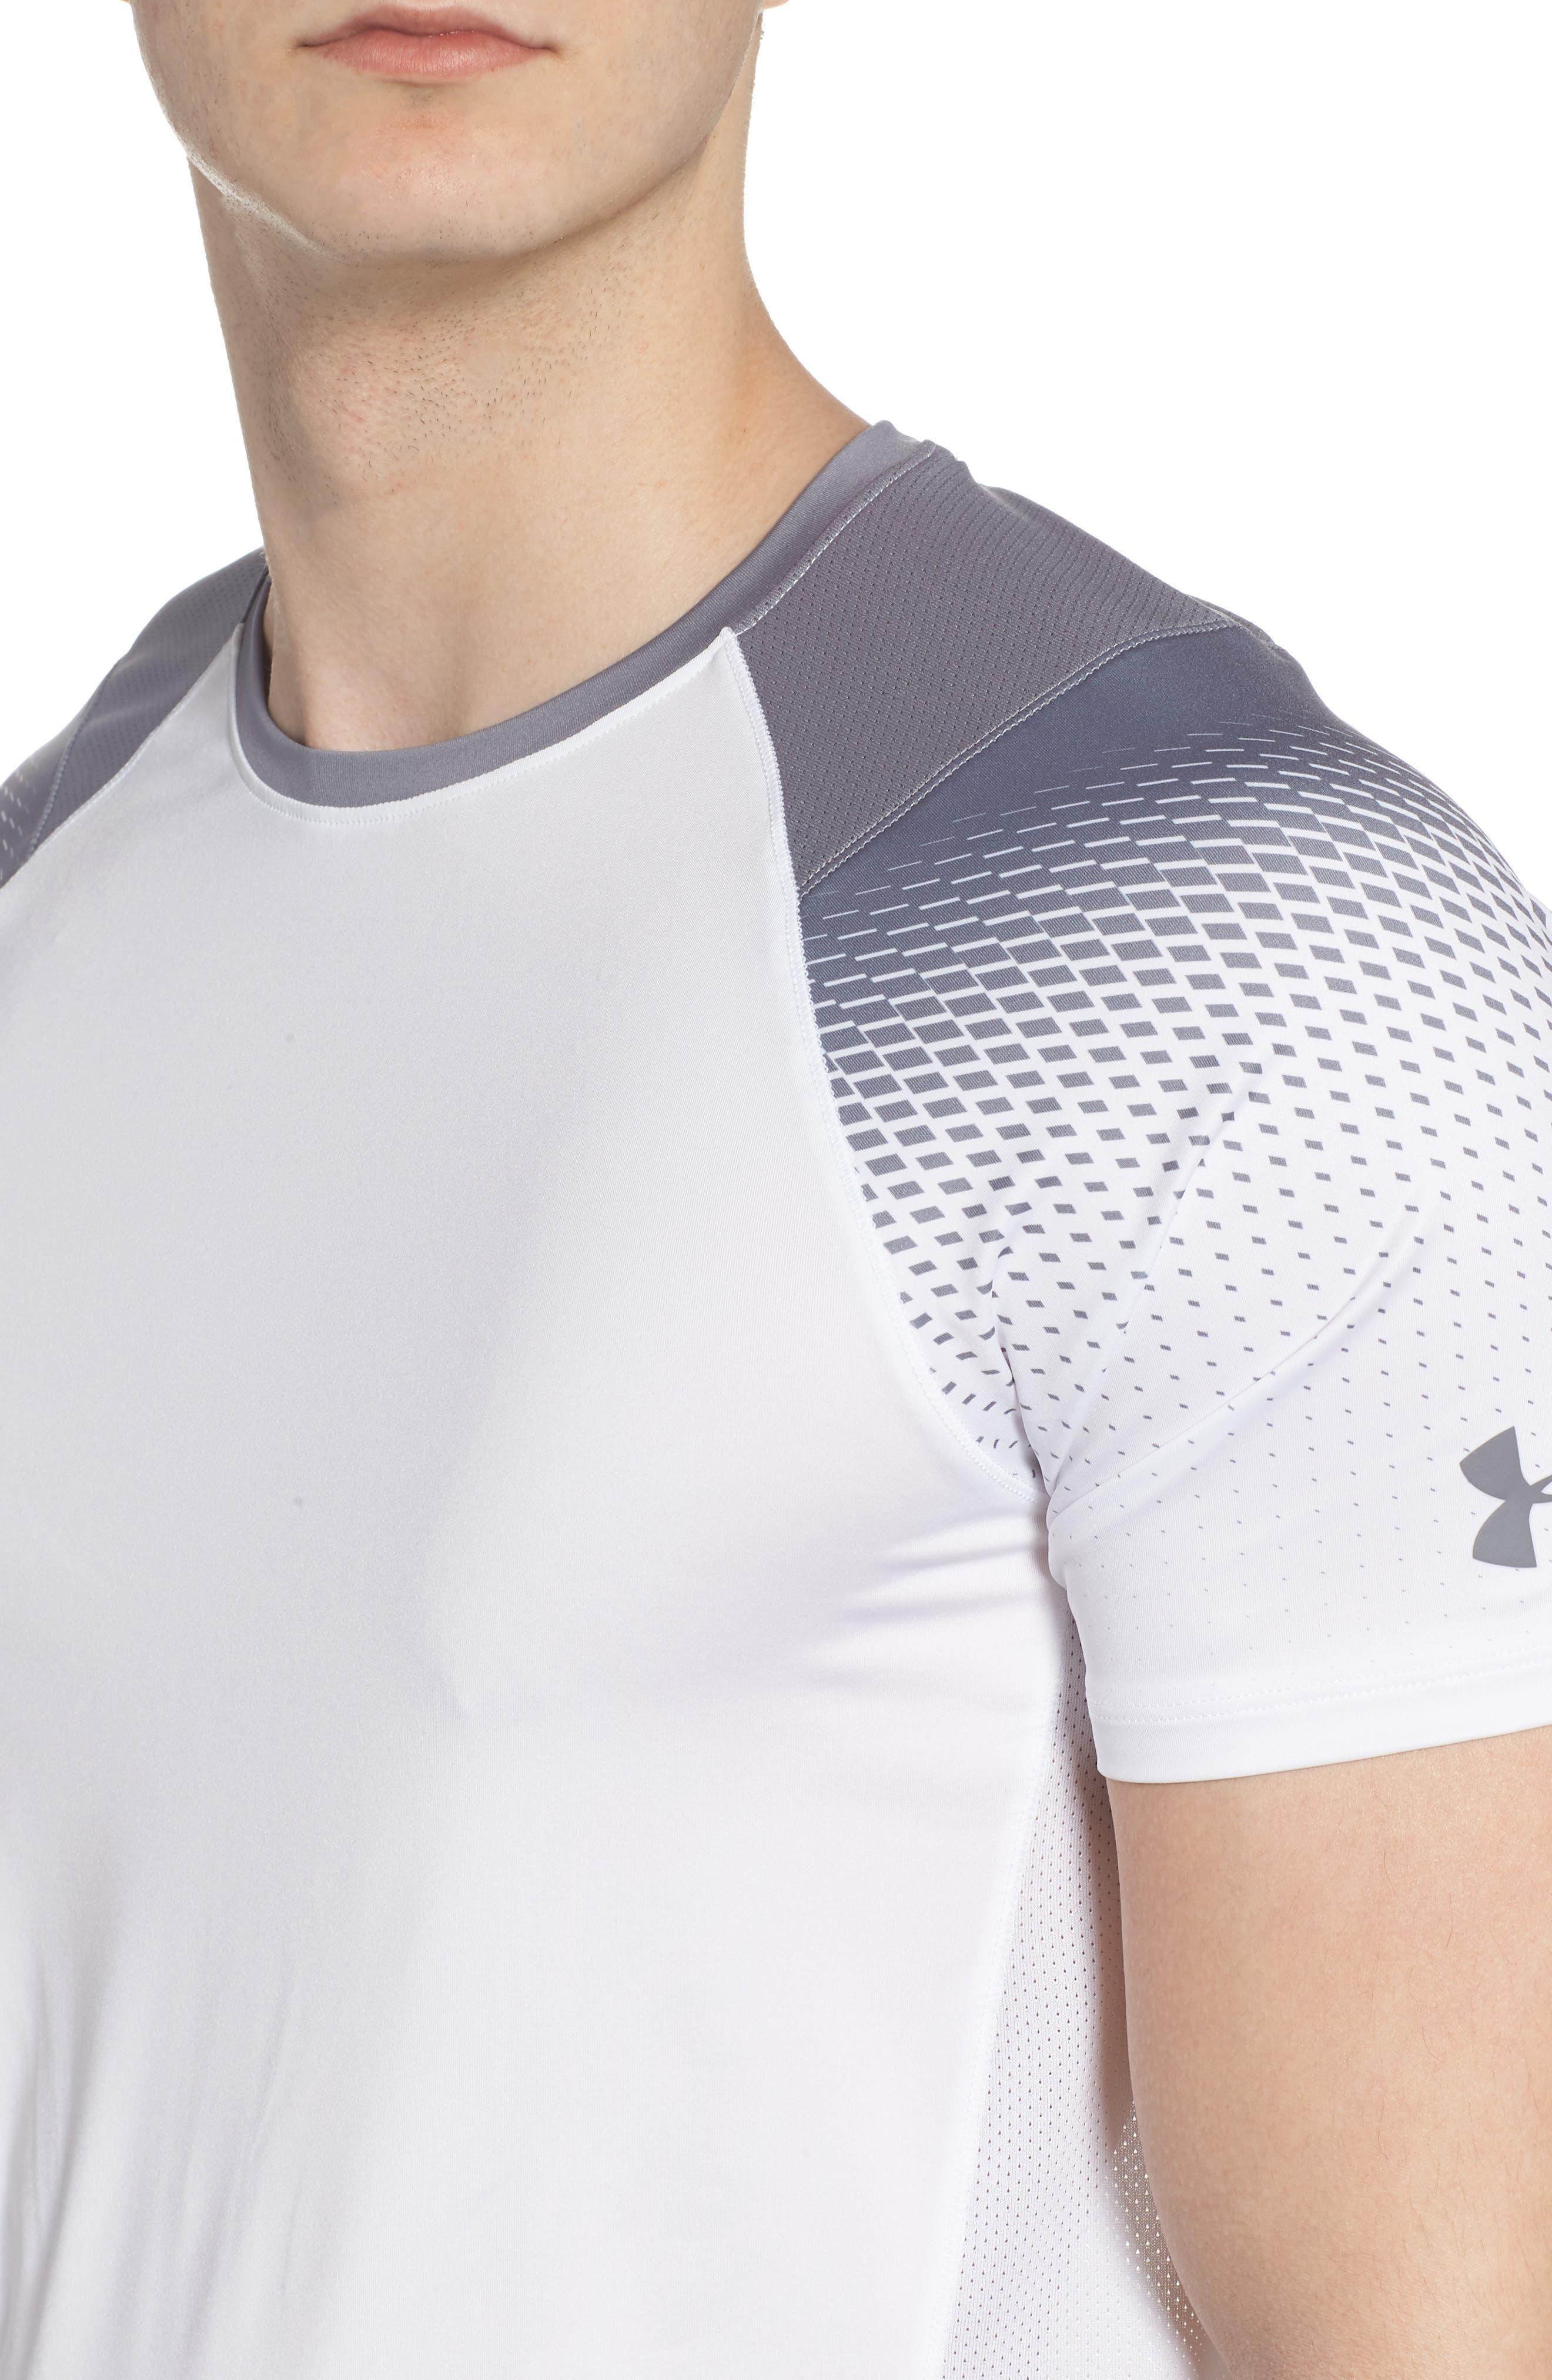 MK1 Dash Print Crewneck T-Shirt,                             Alternate thumbnail 4, color,                             WHITE / ZINC GREH / GRAPHITE